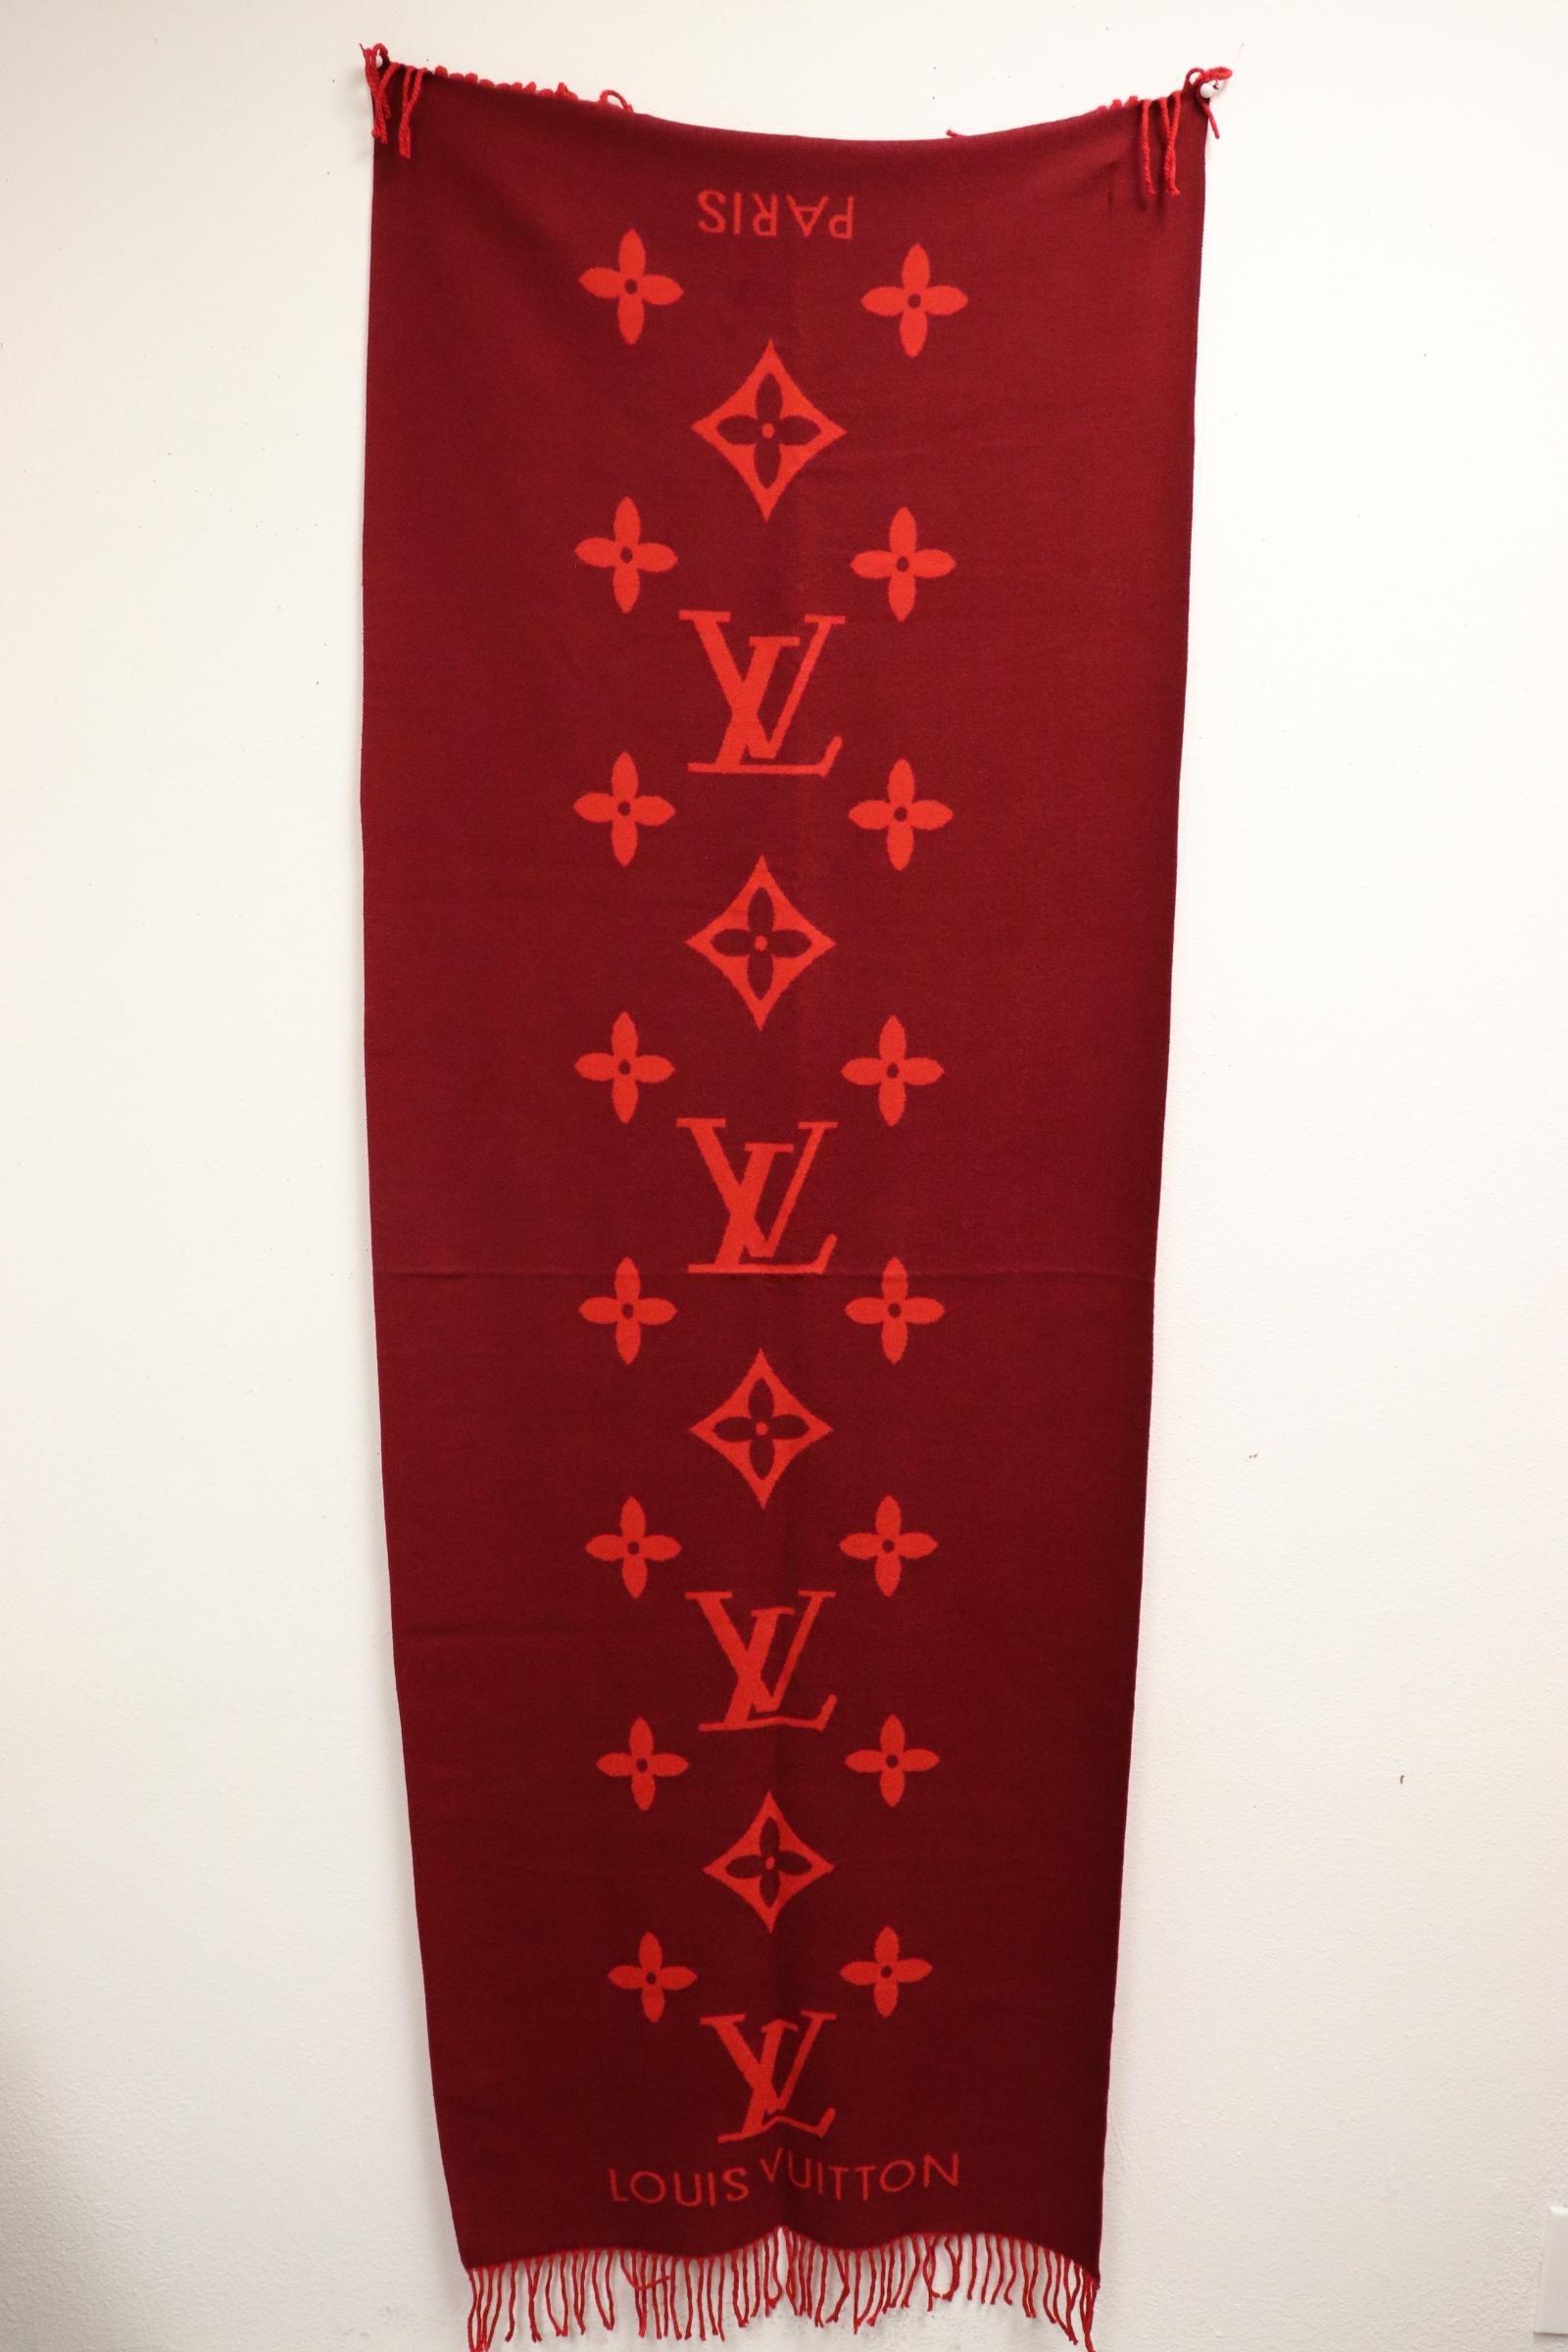 A Louis Vuitton scarf